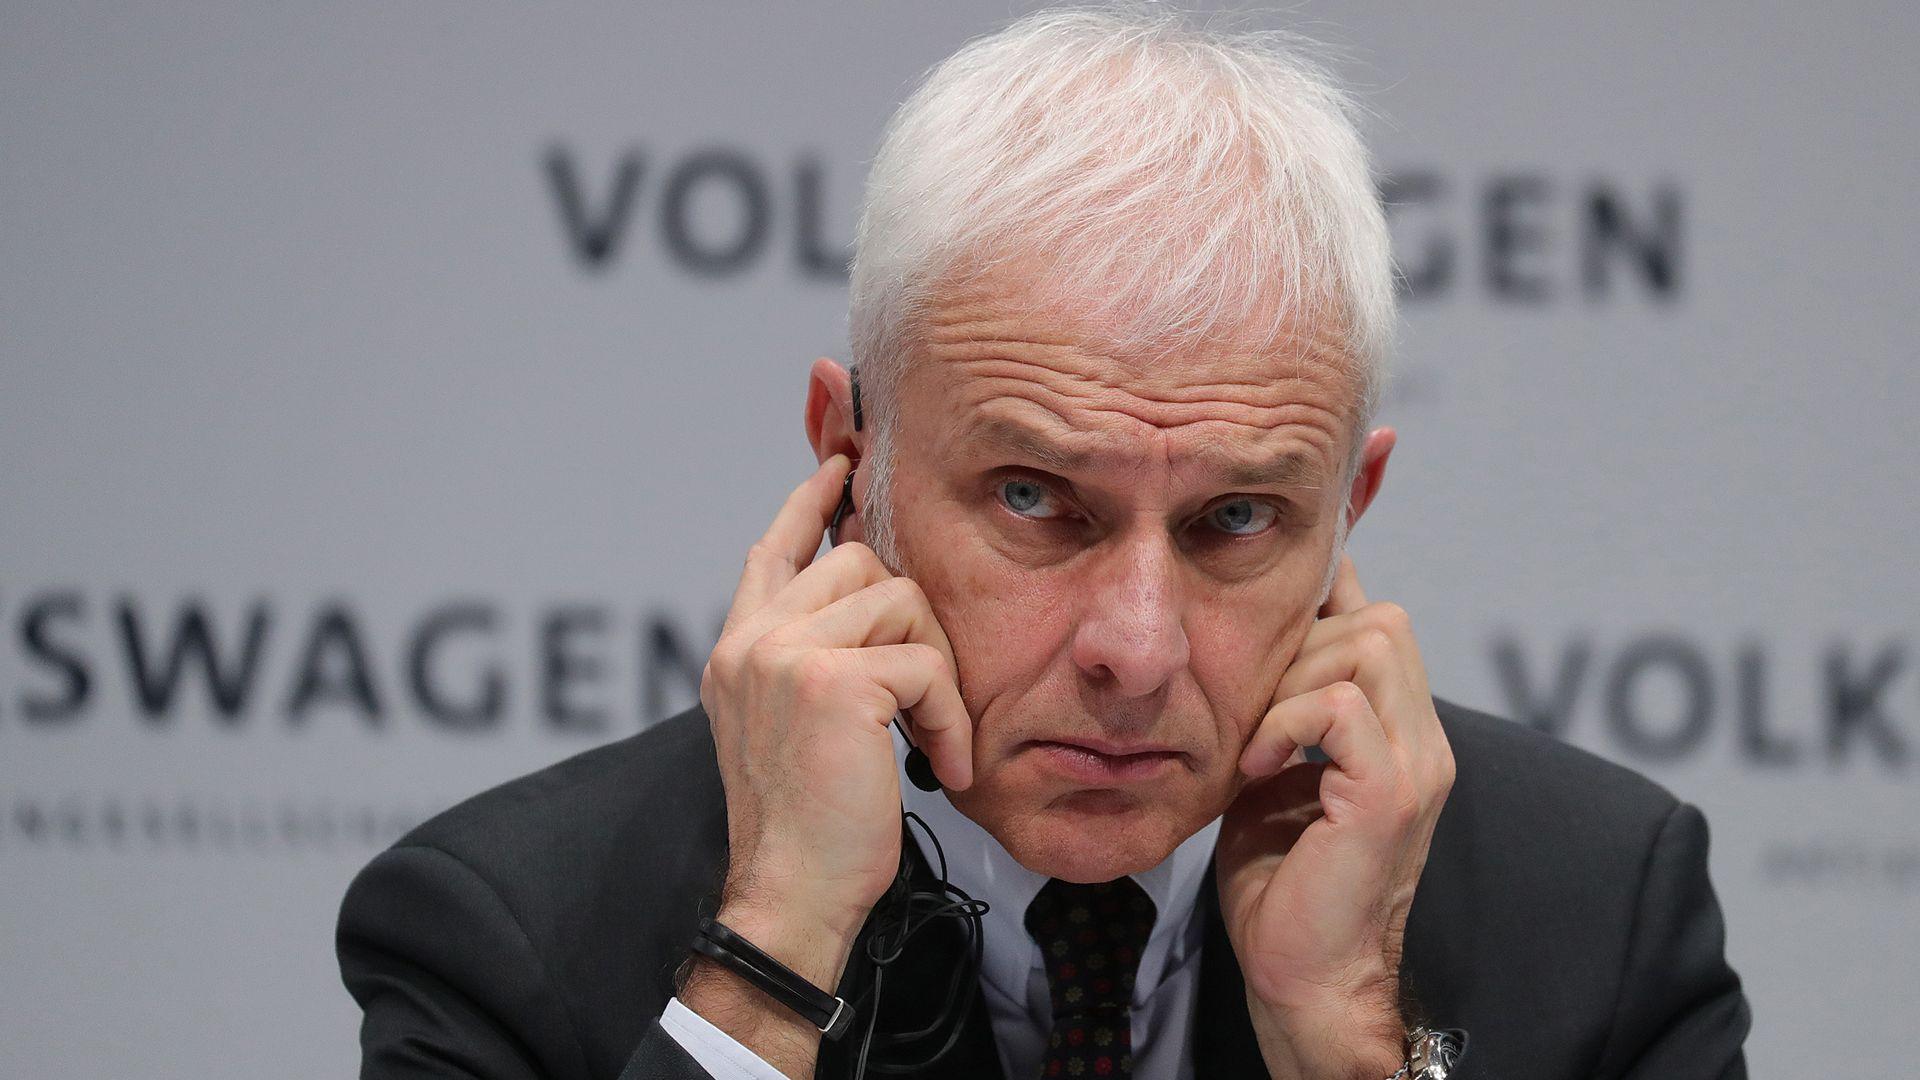 Volkswagen CEO Mattias Muller